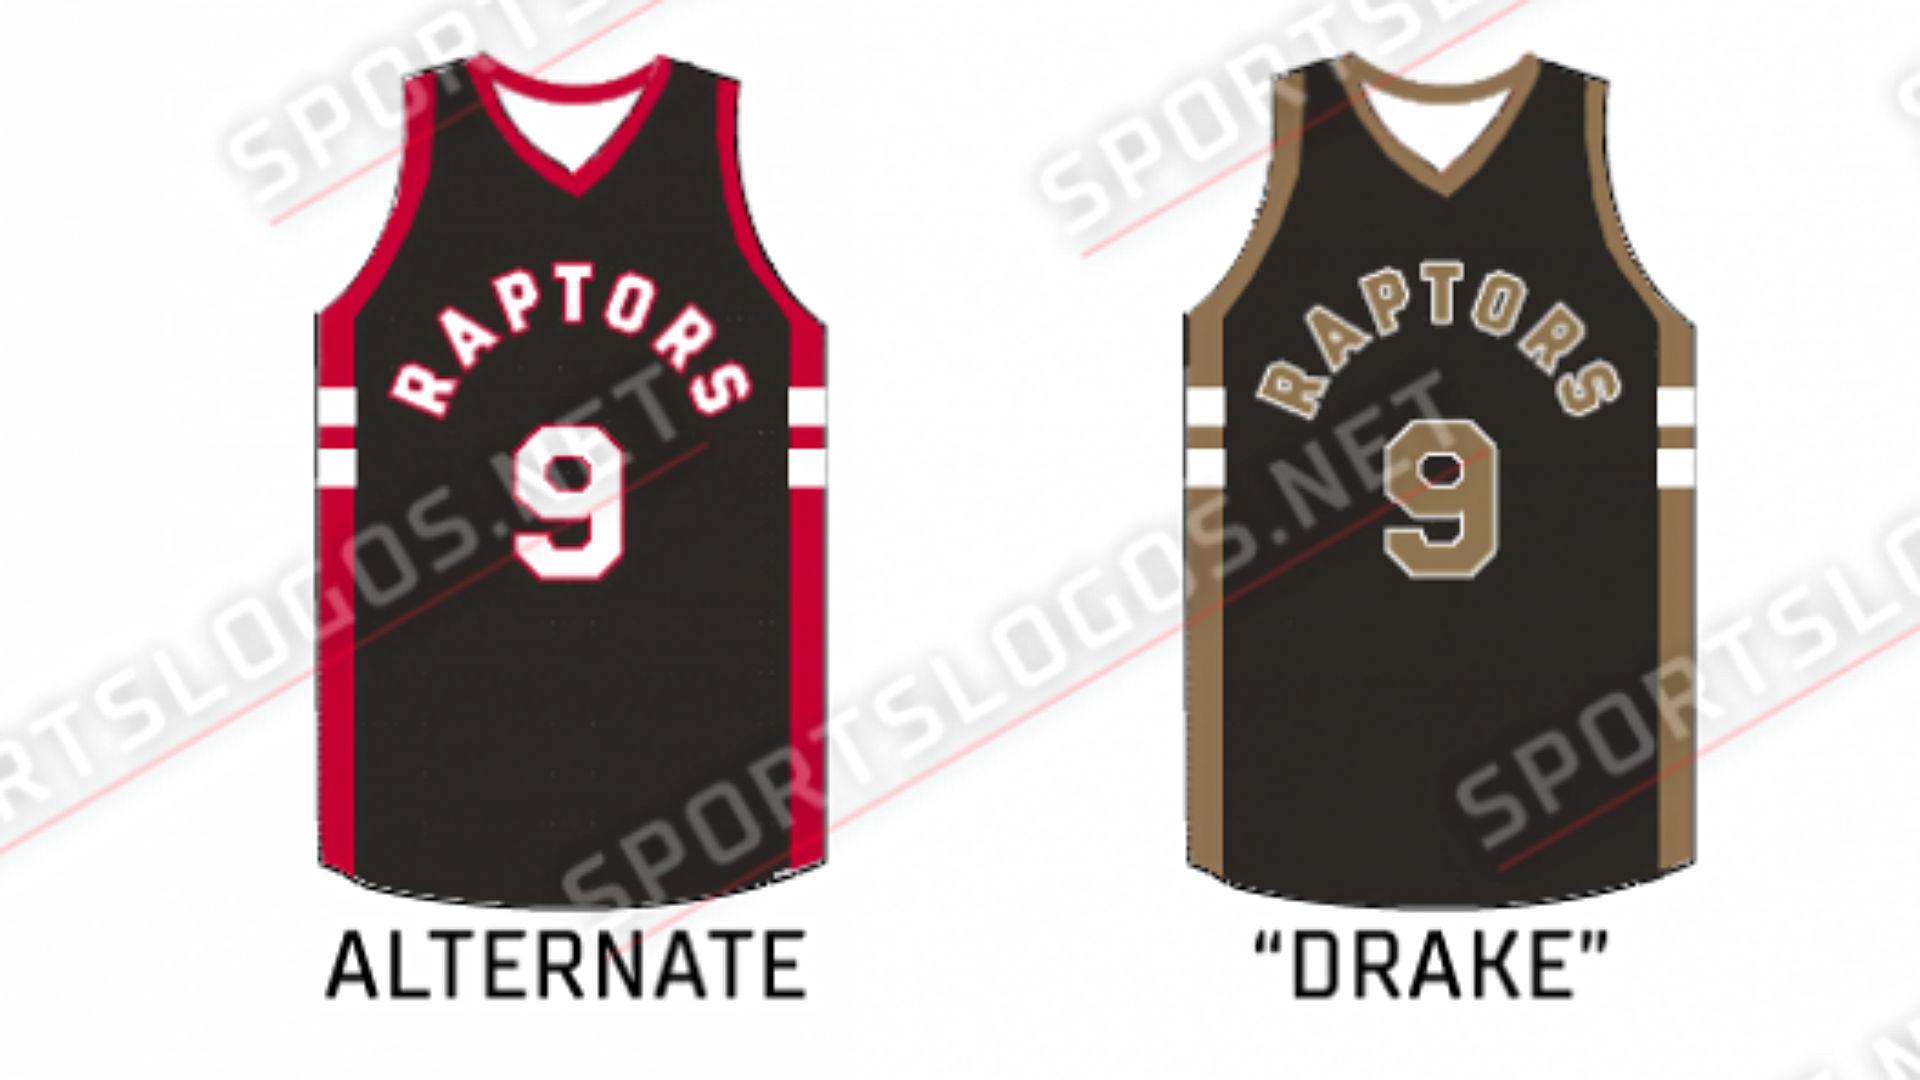 f0f9adf9729 Raptors' new 'Drake' alternate uniform leaked | Sporting News